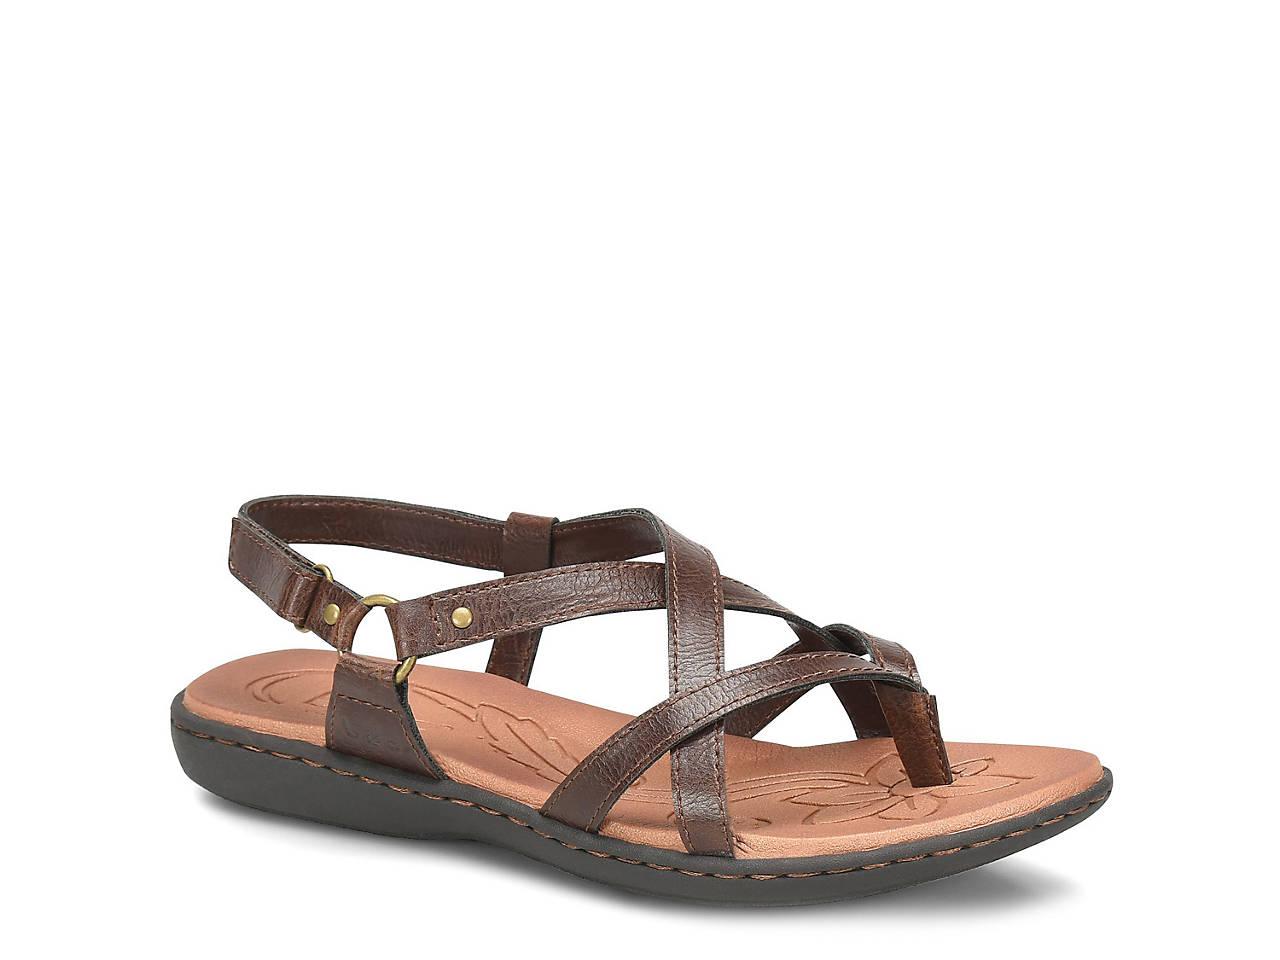 8cc9ea99010e74 b.o.c Pearly Sandal Women s Shoes